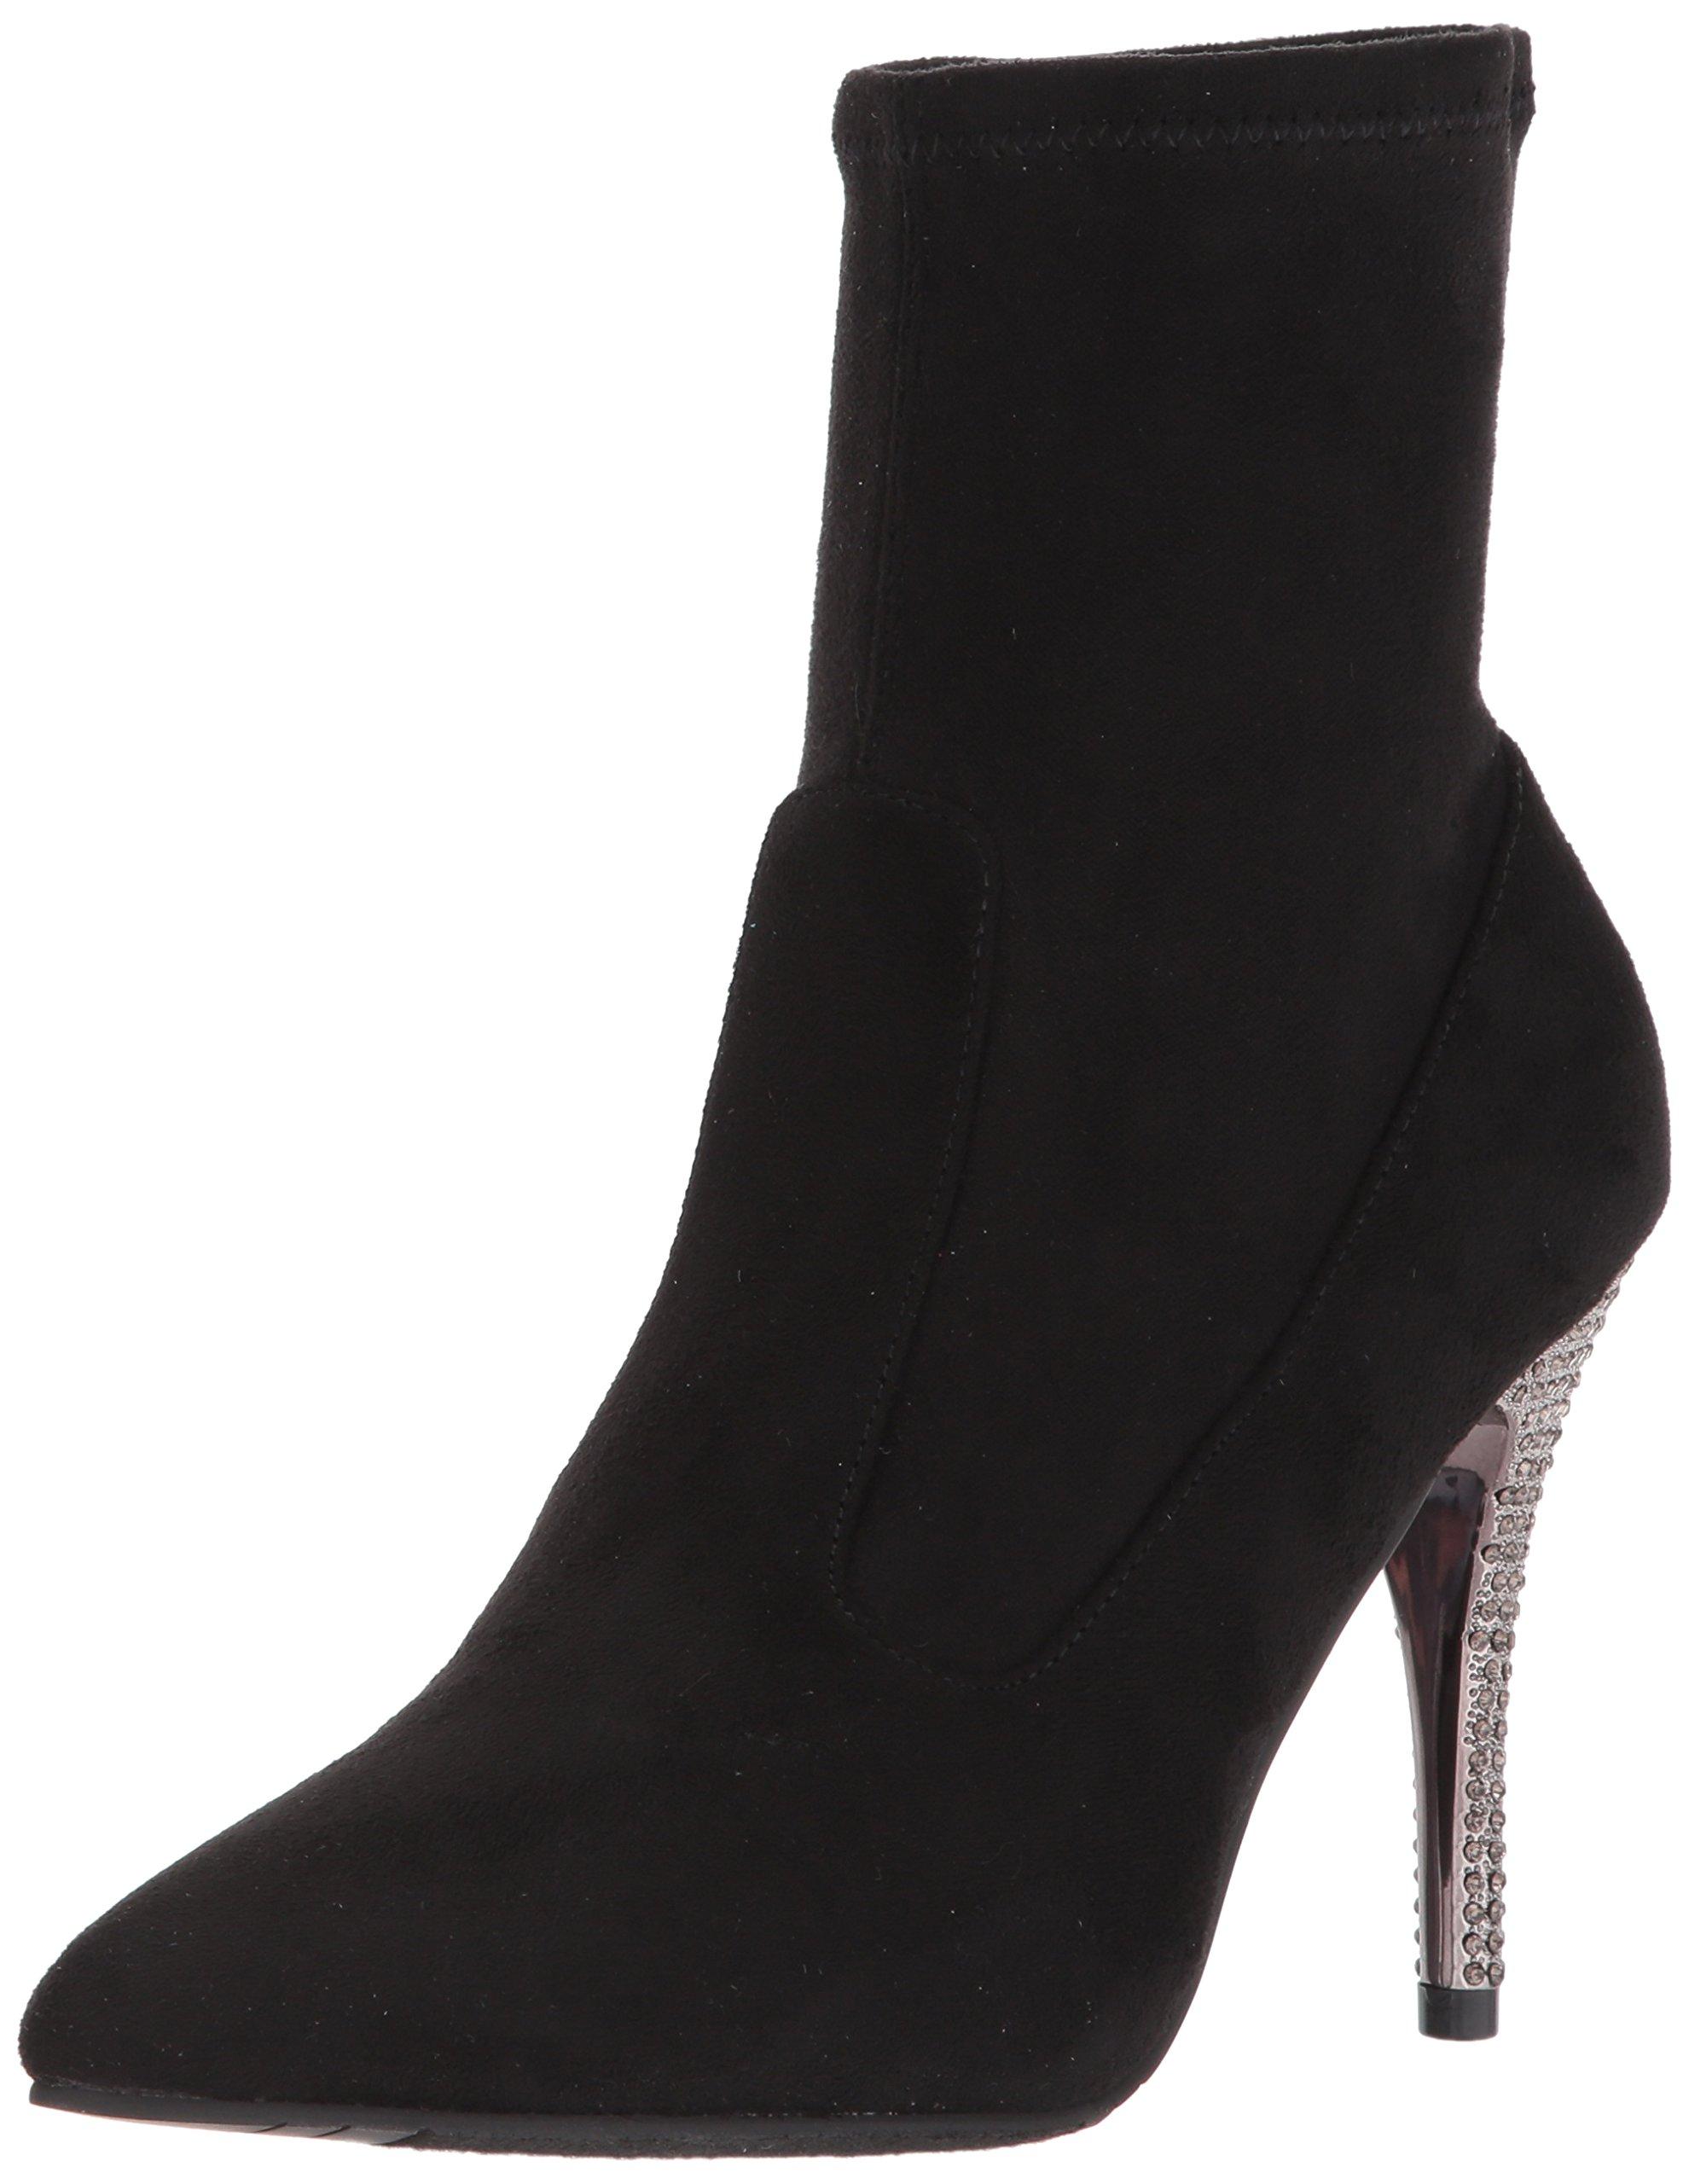 Nina Women's Roxie Ankle Bootie, Suede-True Black, 5 M US